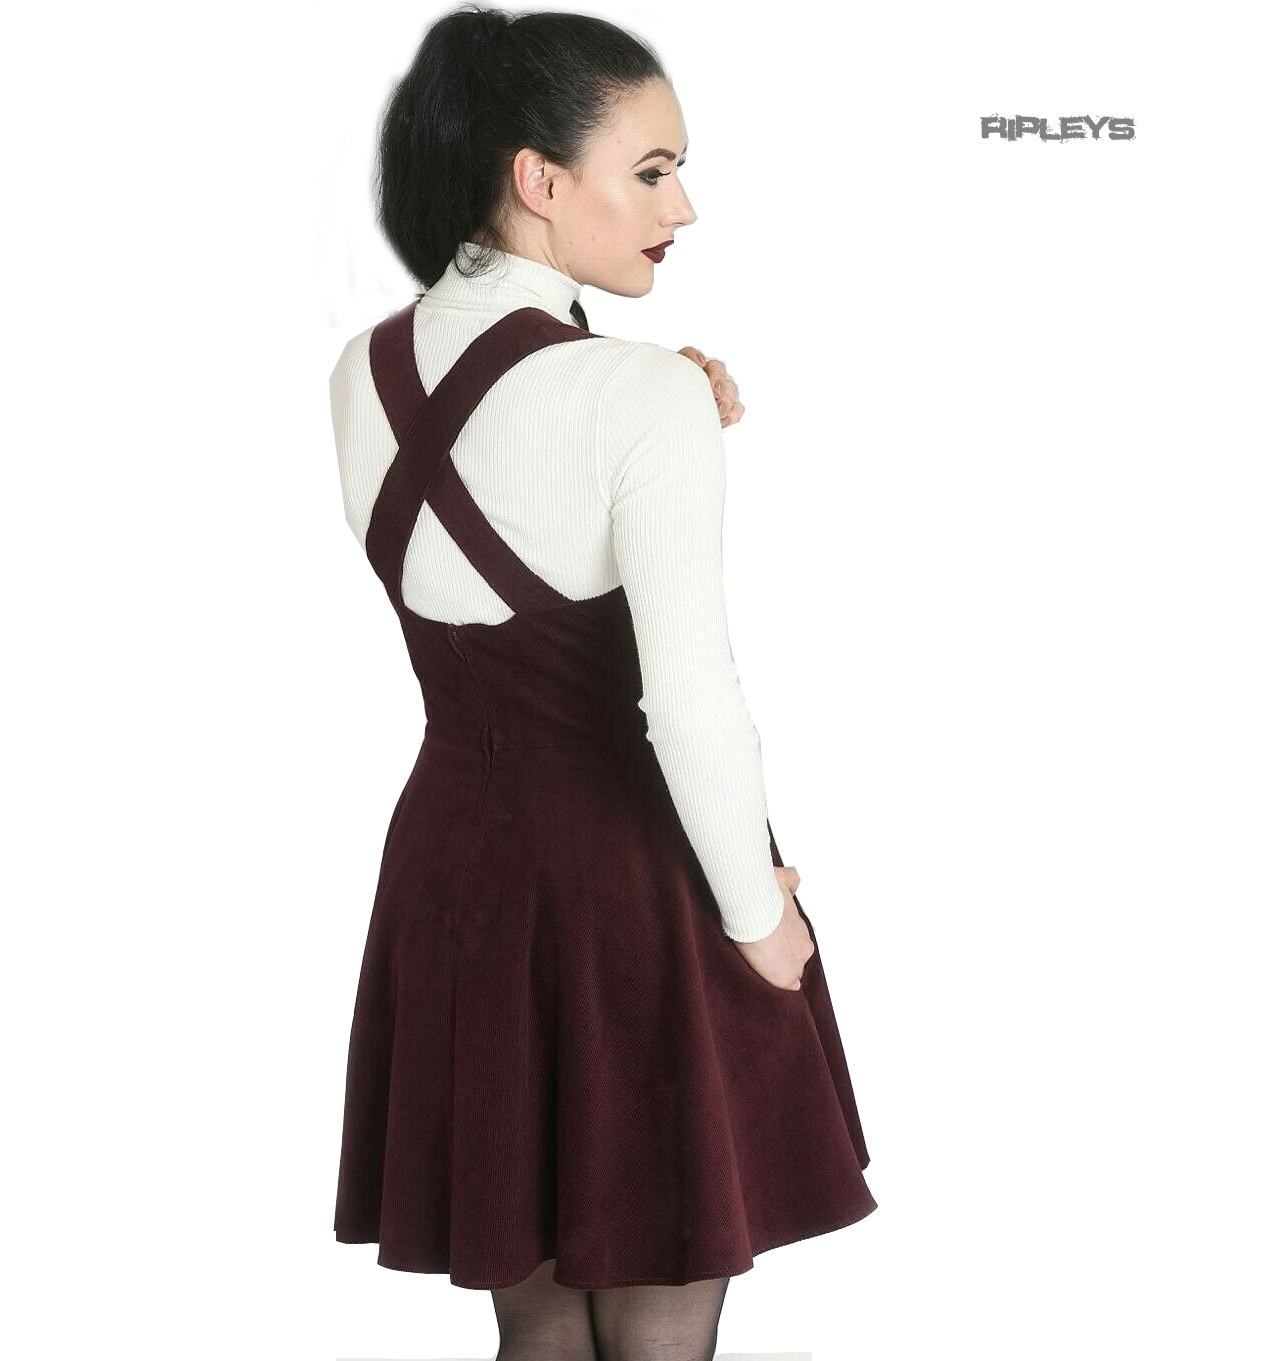 Hell-Bunny-Rockabilly-Corduroy-Mini-Dress-WONDER-YEARS-Pinafore-Wine-All-Sizes thumbnail 12